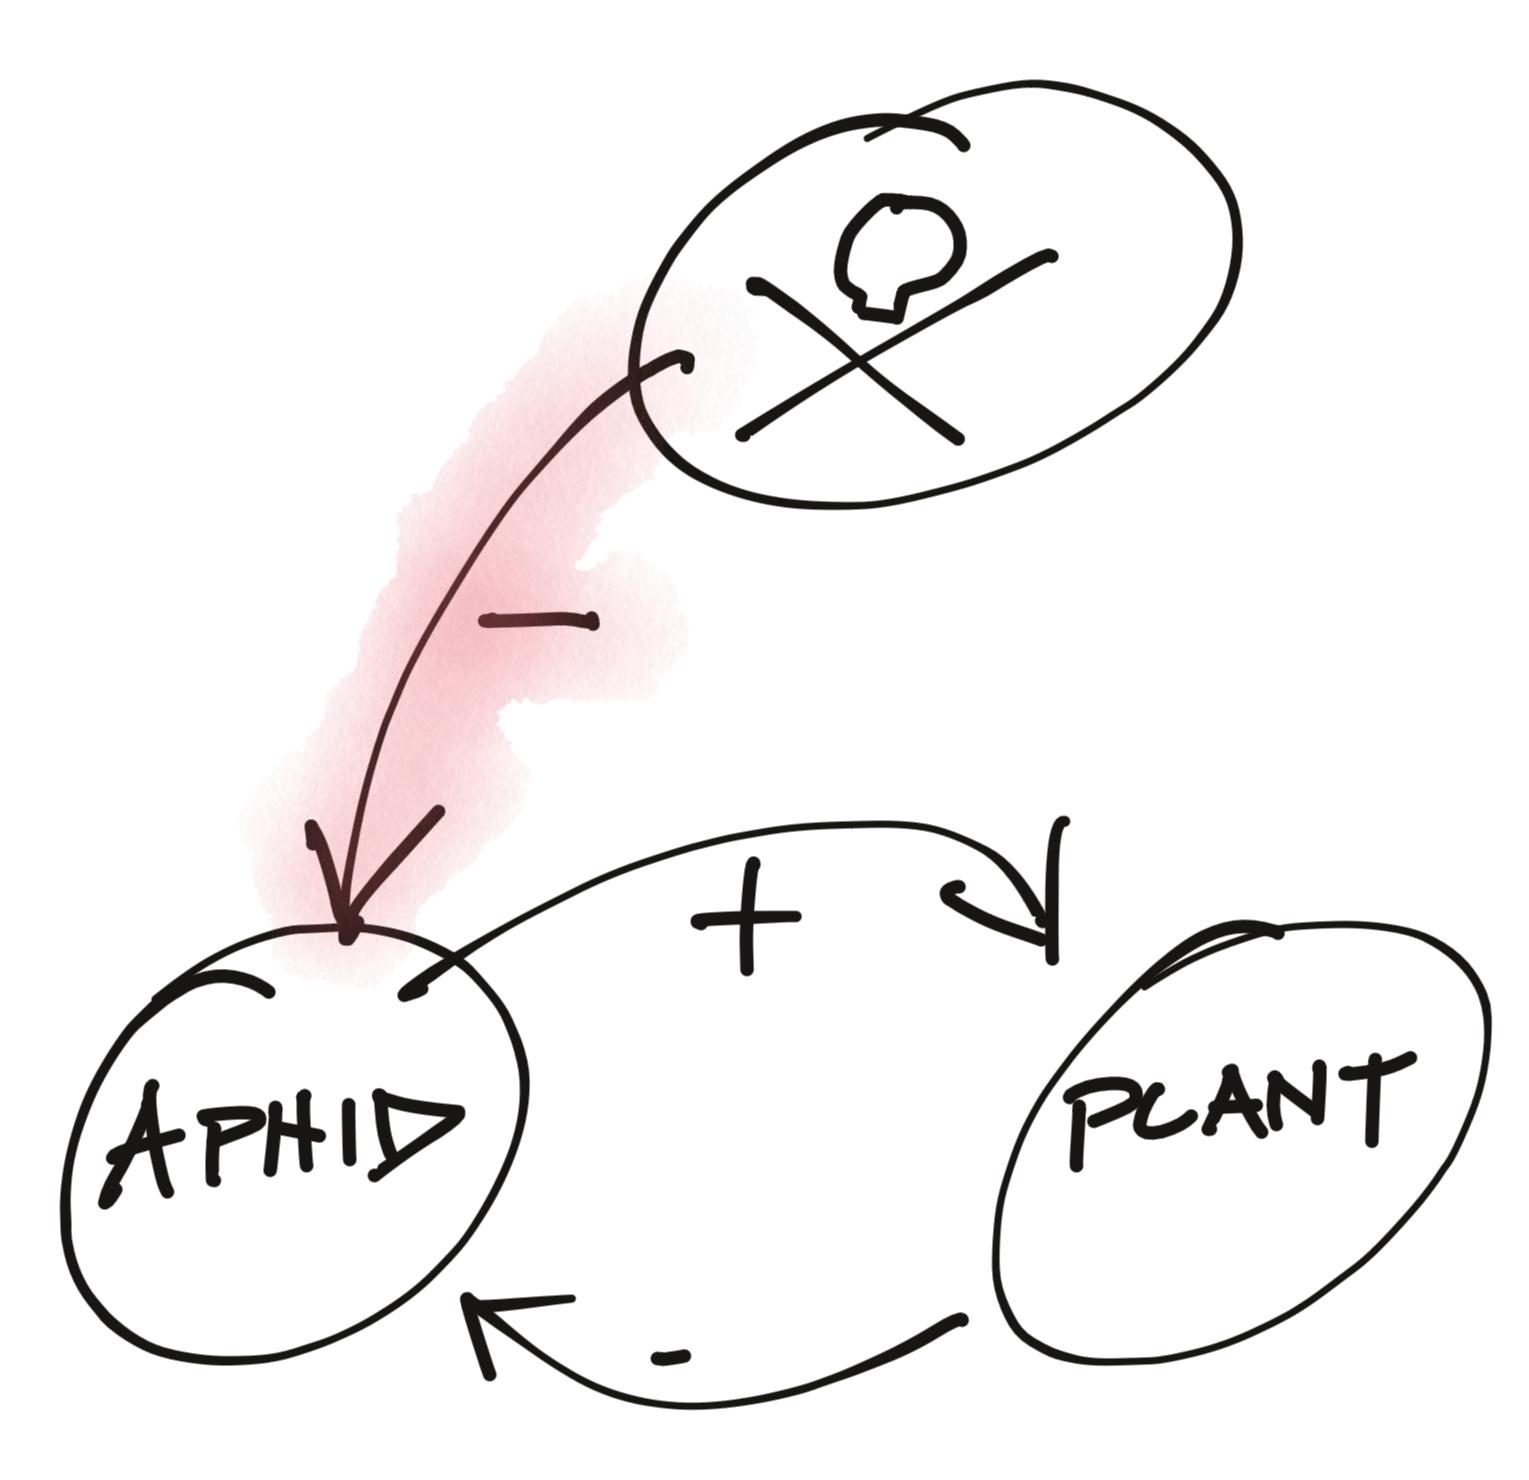 Apfid Ballenced Systems Model